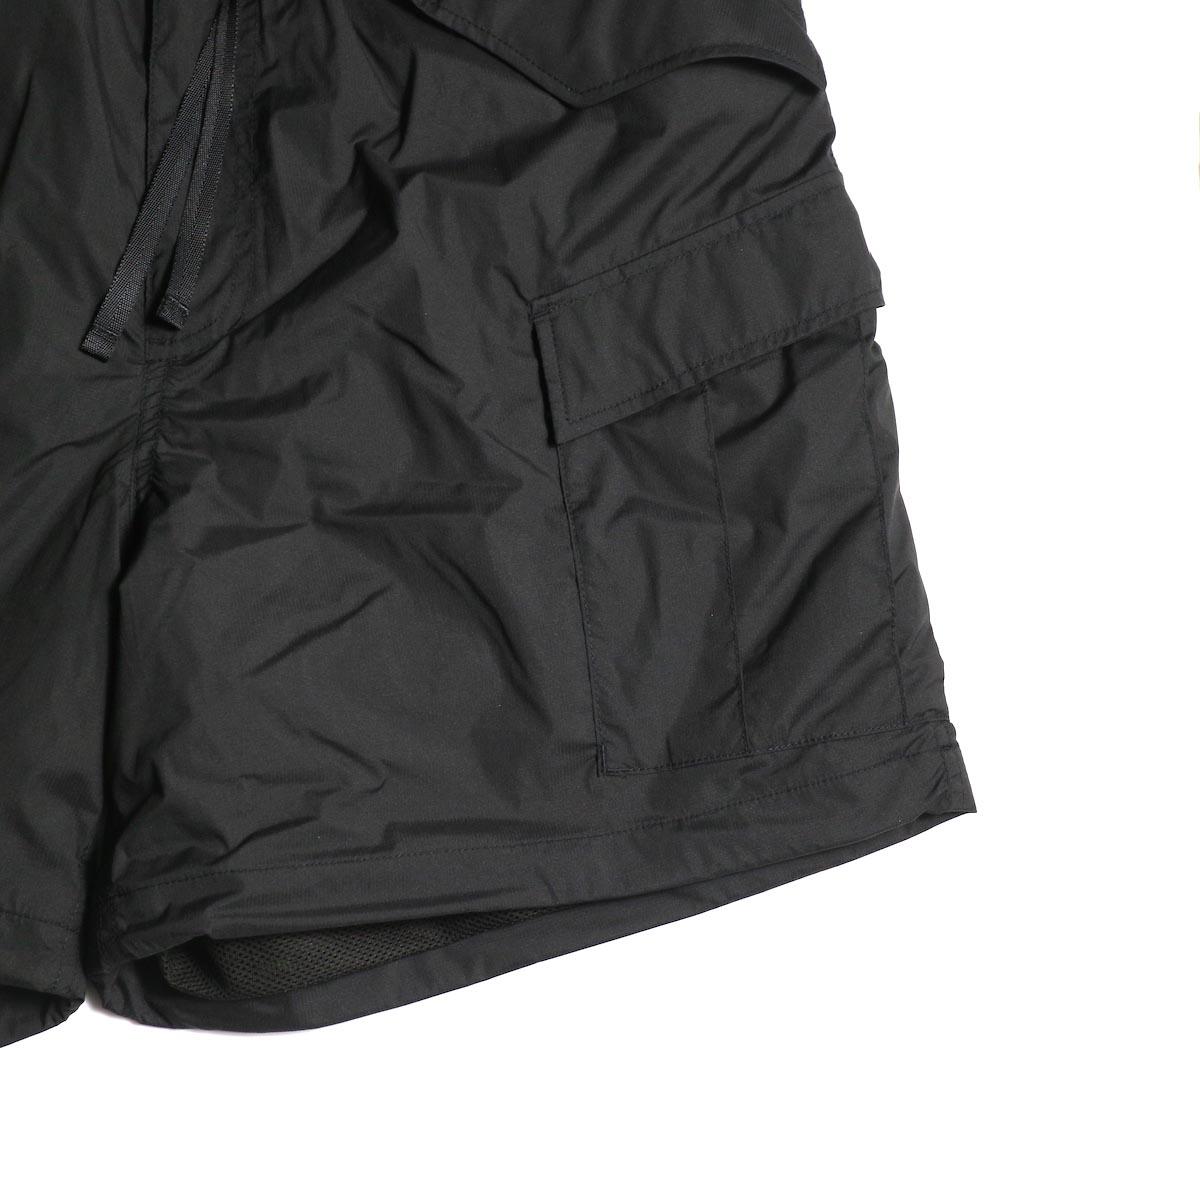 DAIWA PIER39 / Micro Rip-Stop Easy 6P Shorts (Black)ポケット